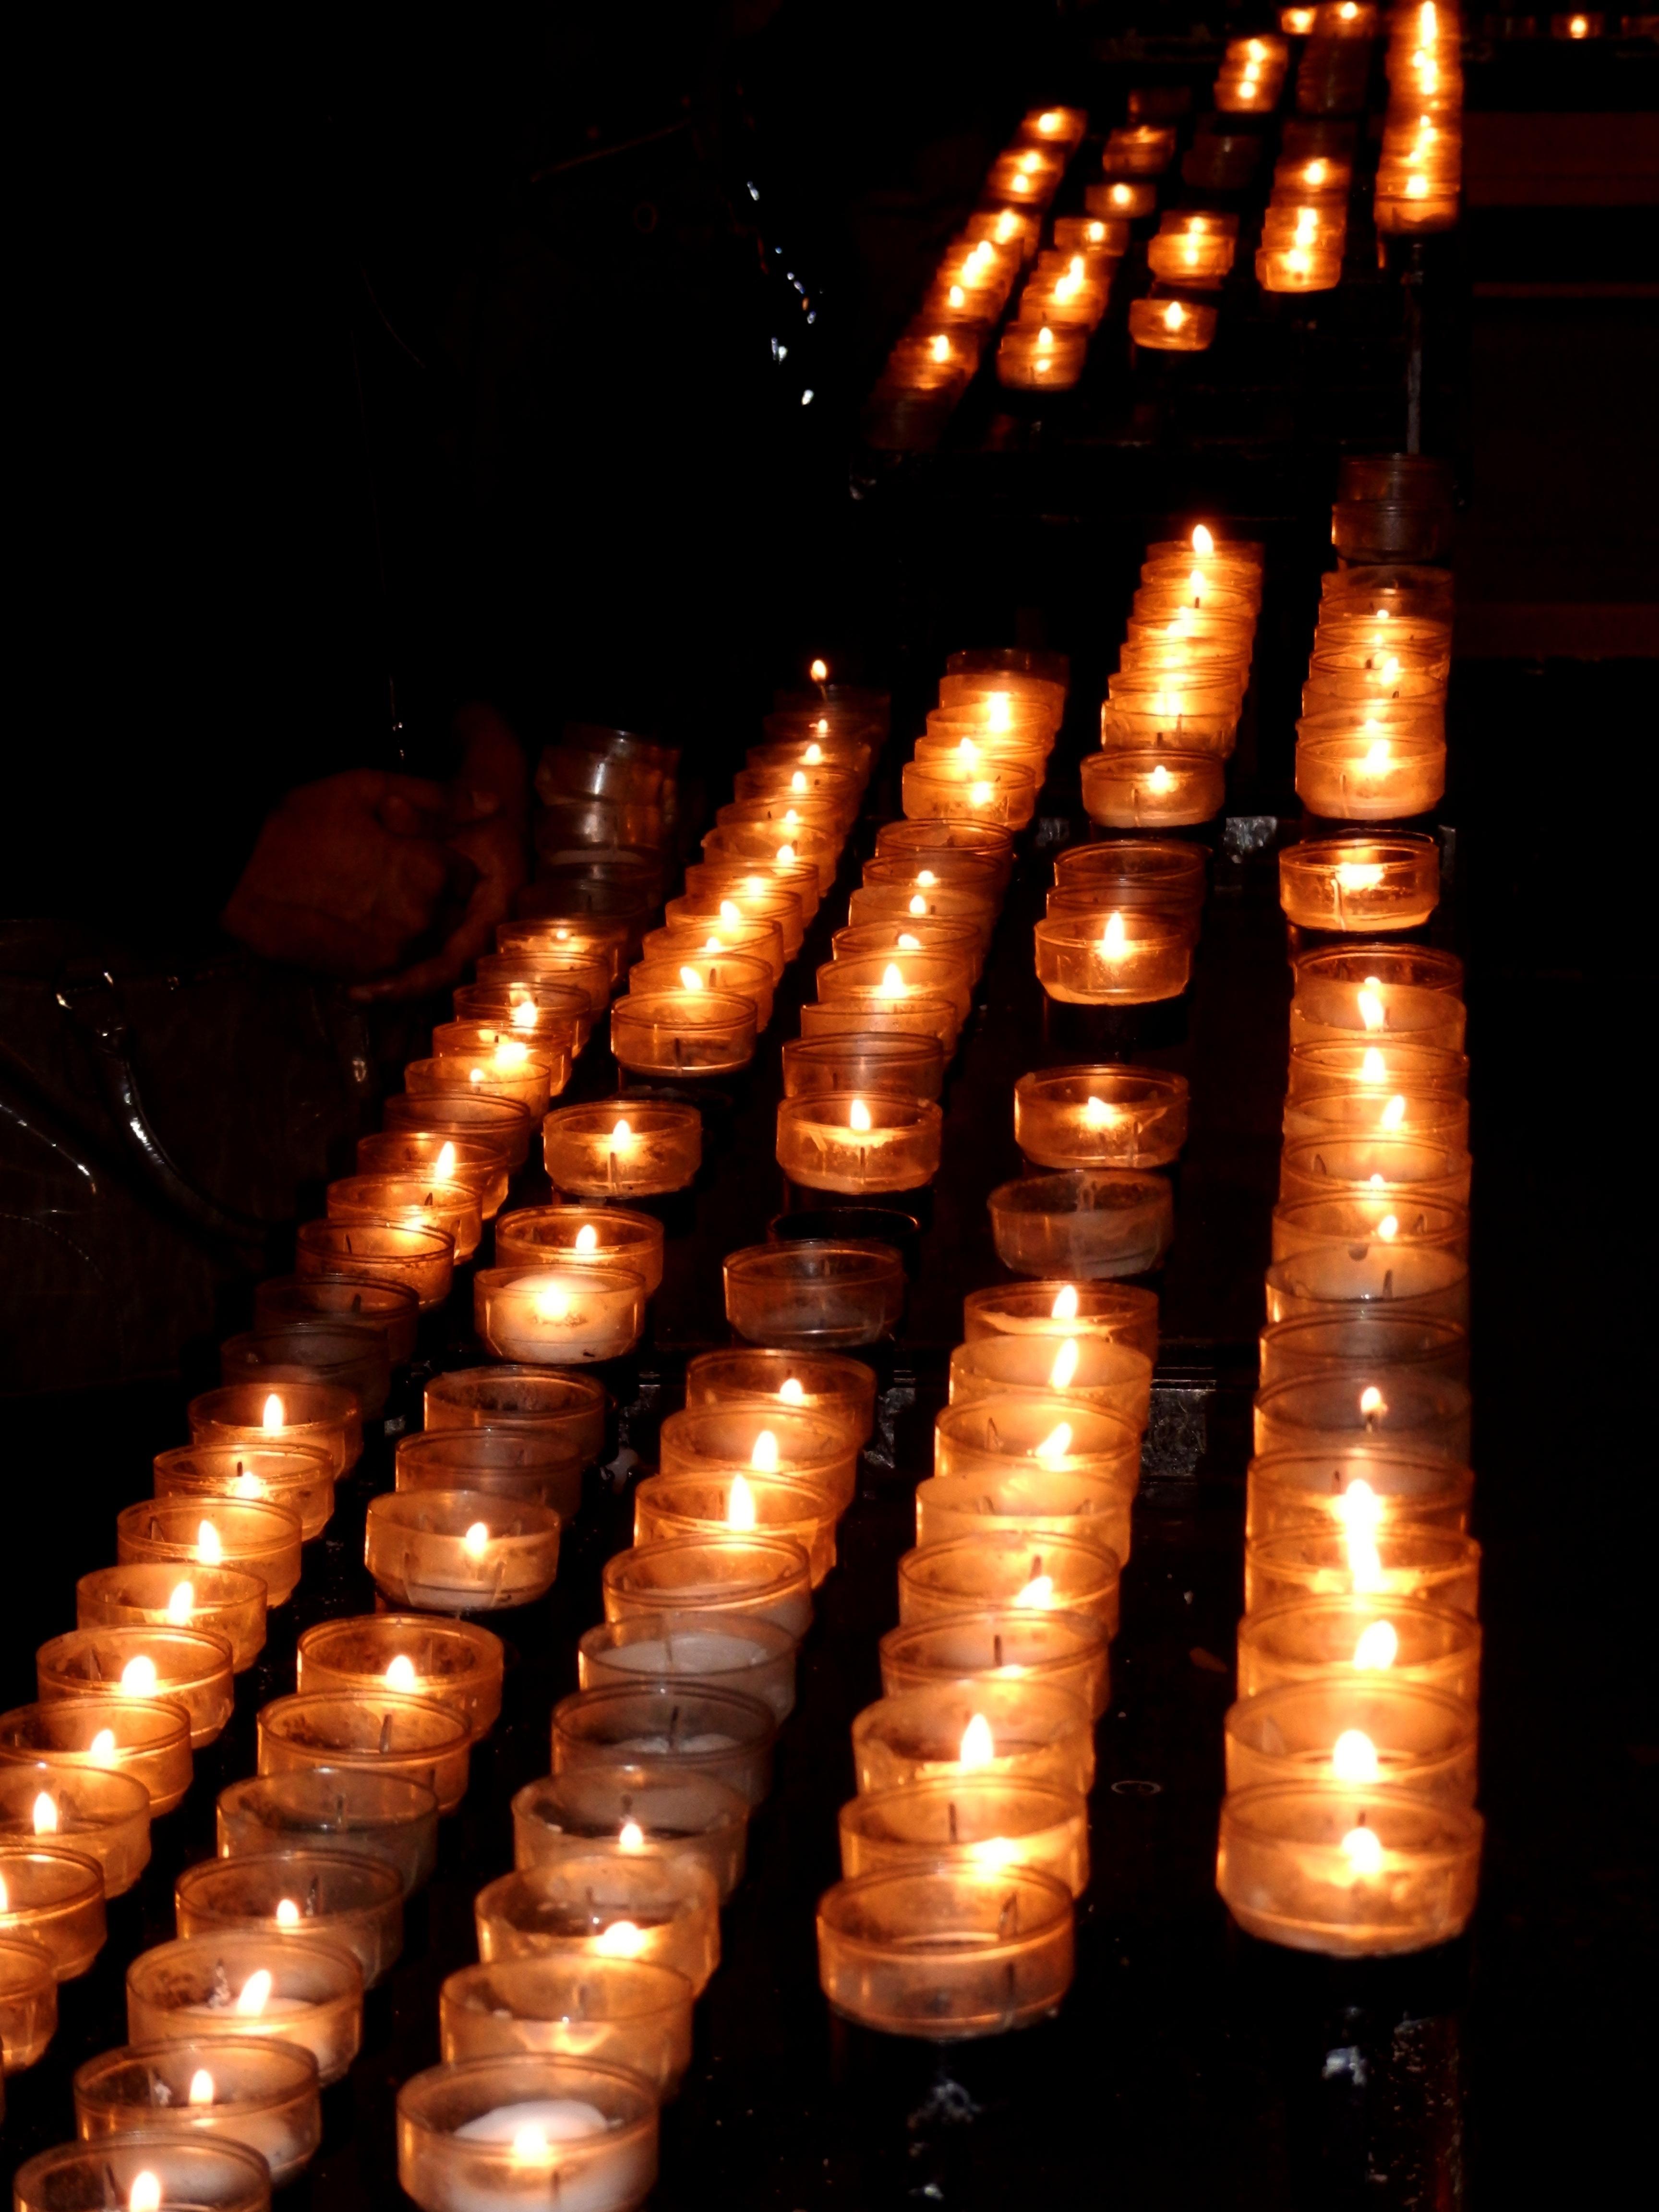 Light Church Lighting Pray